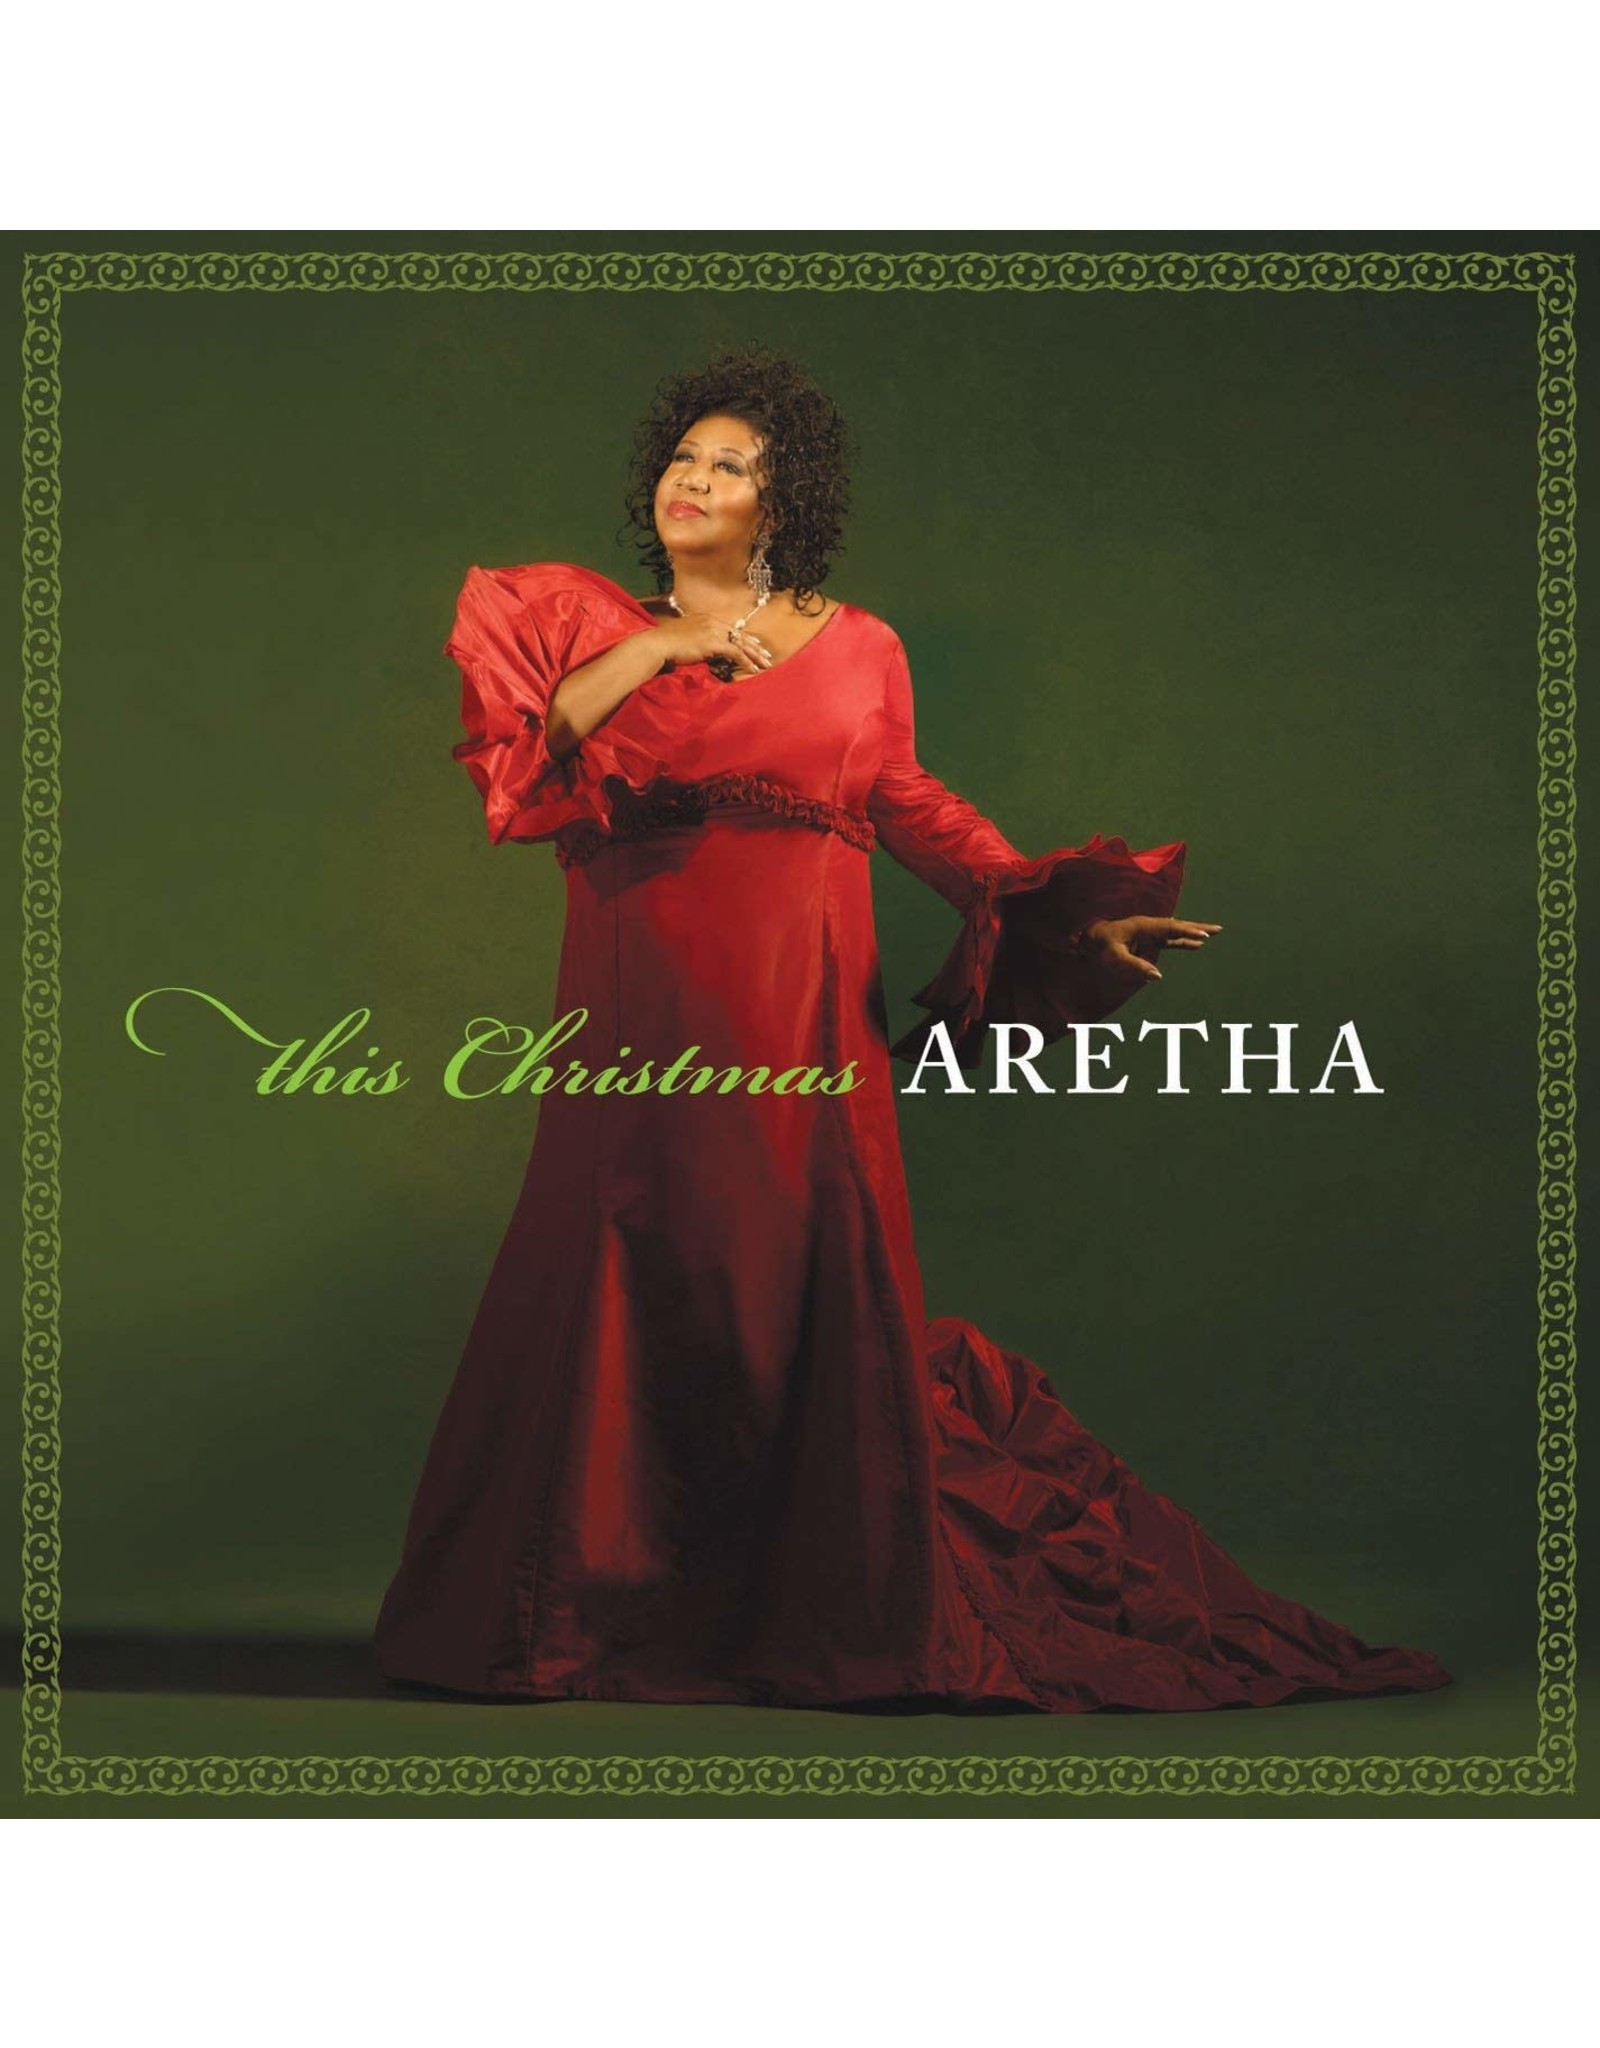 Aretha Franklin - This Christmas